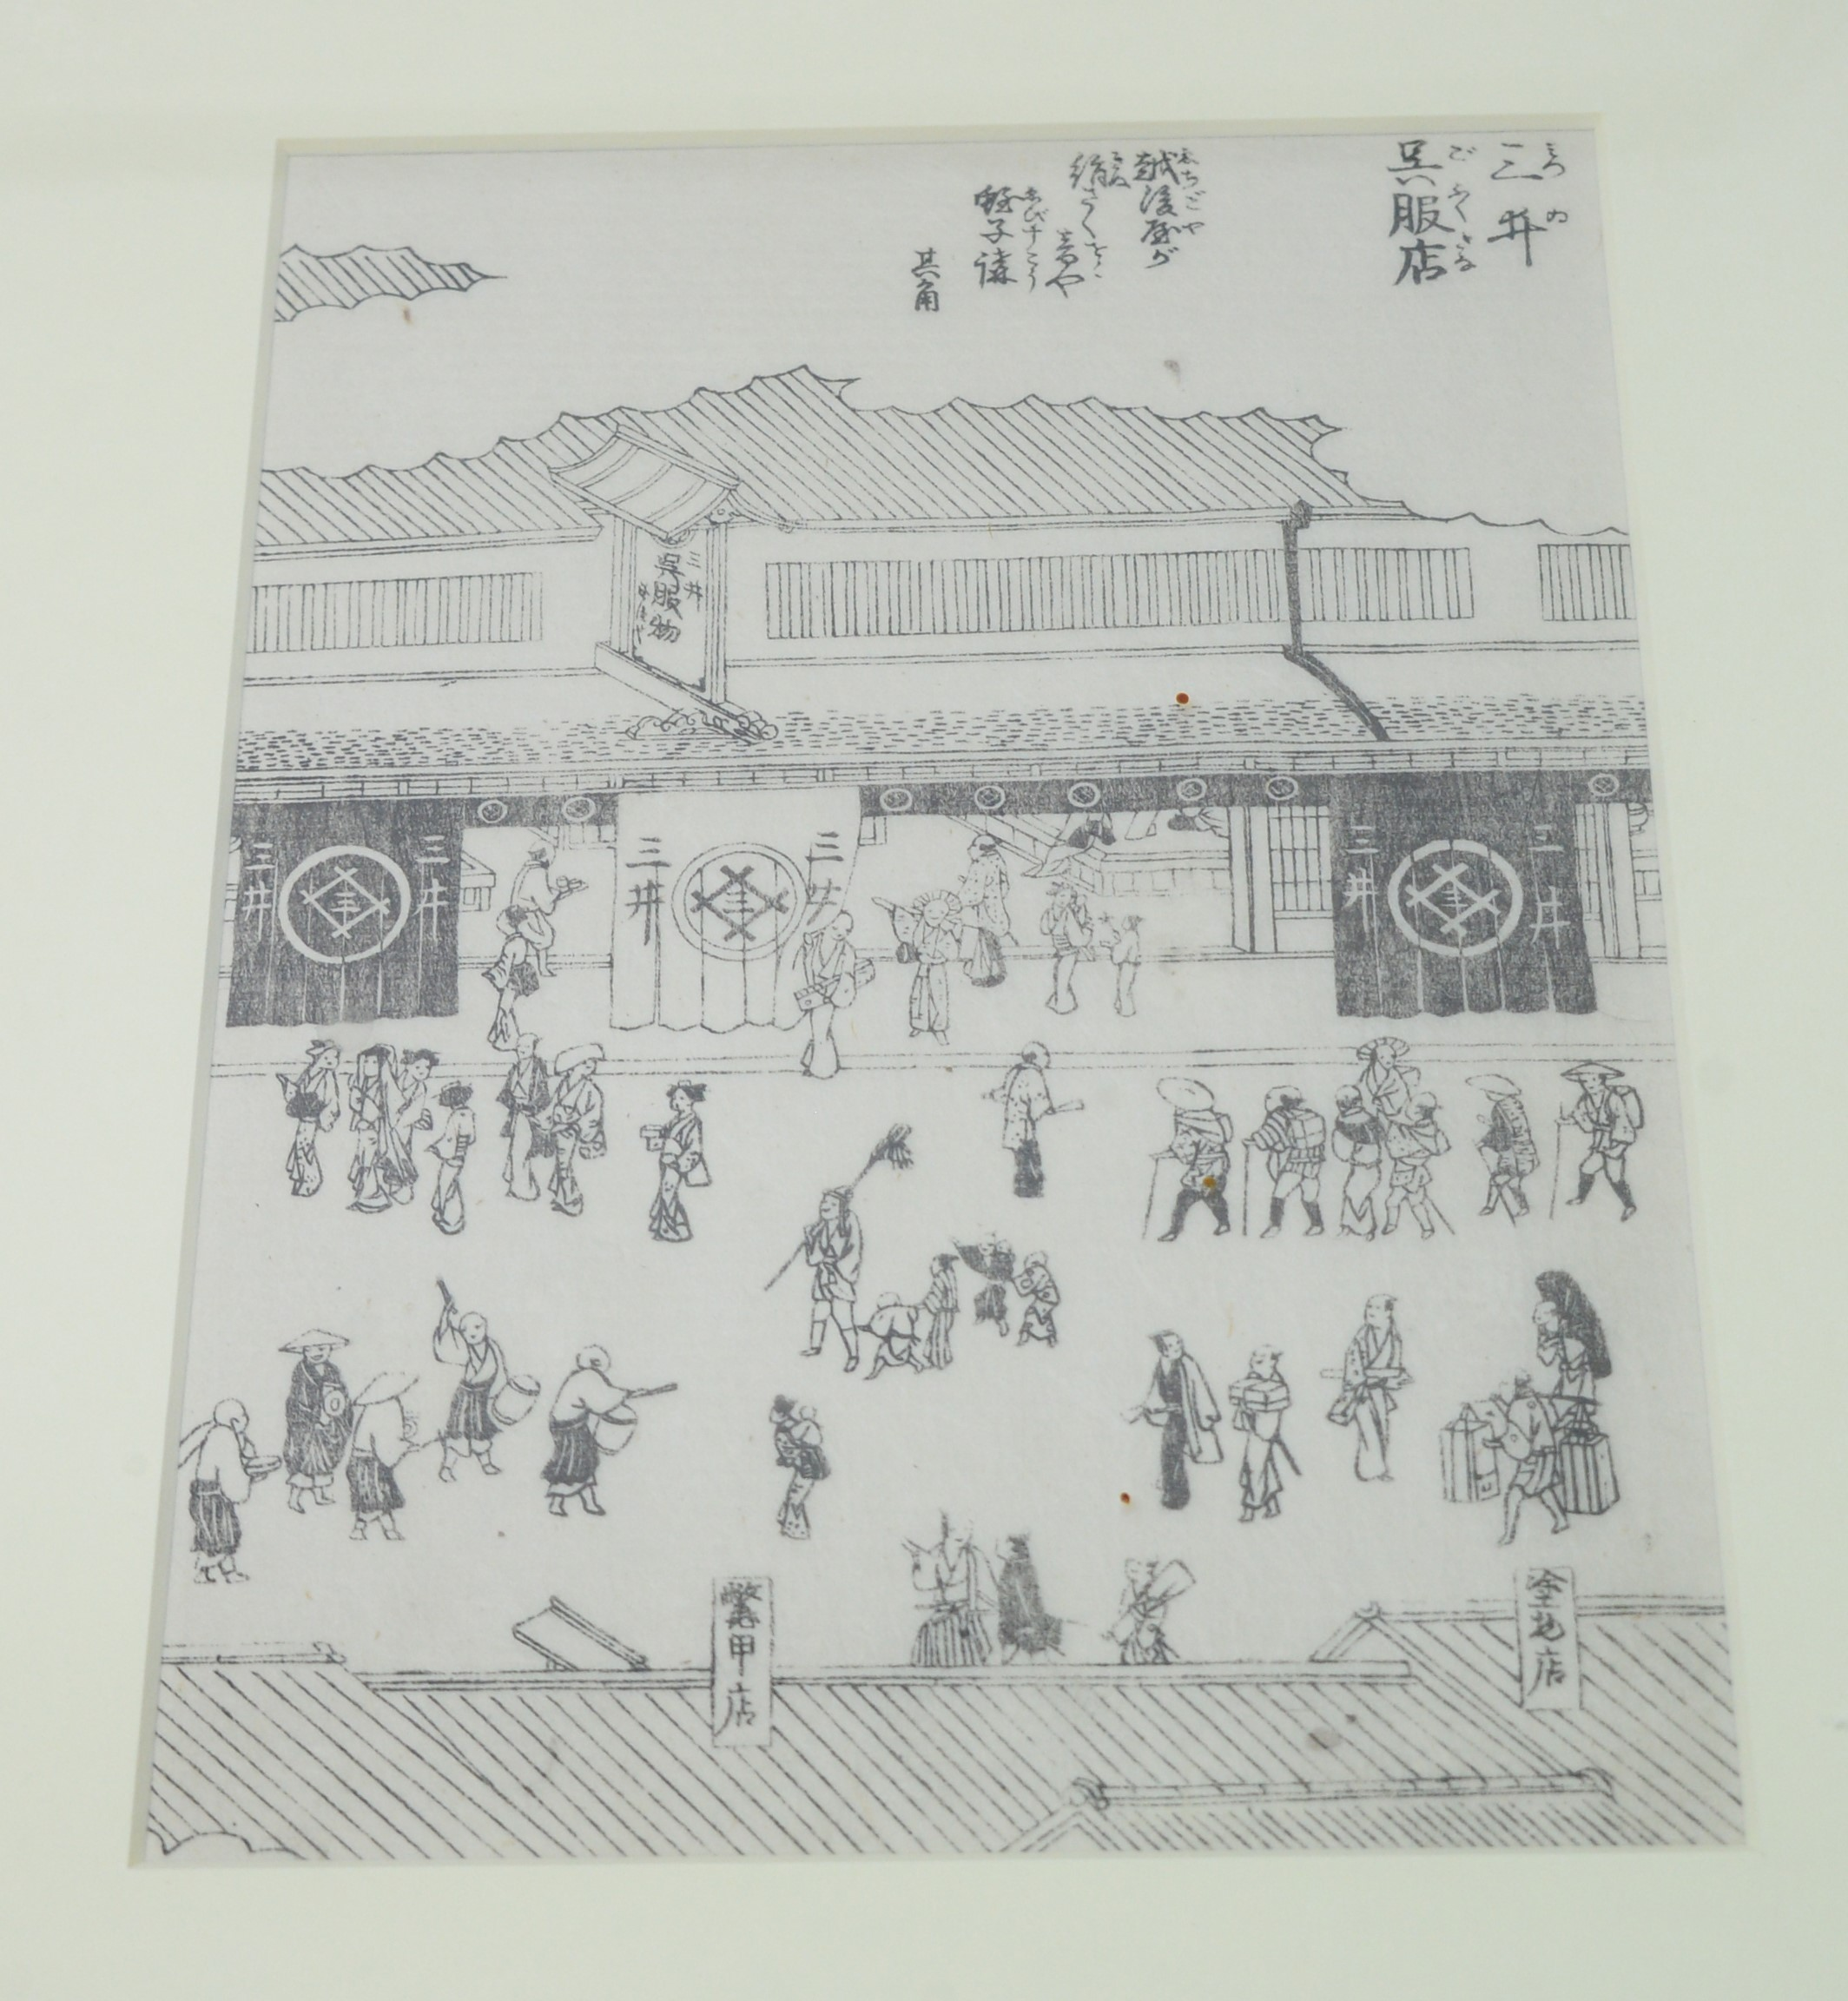 Japanese School - prints. - Image 3 of 3